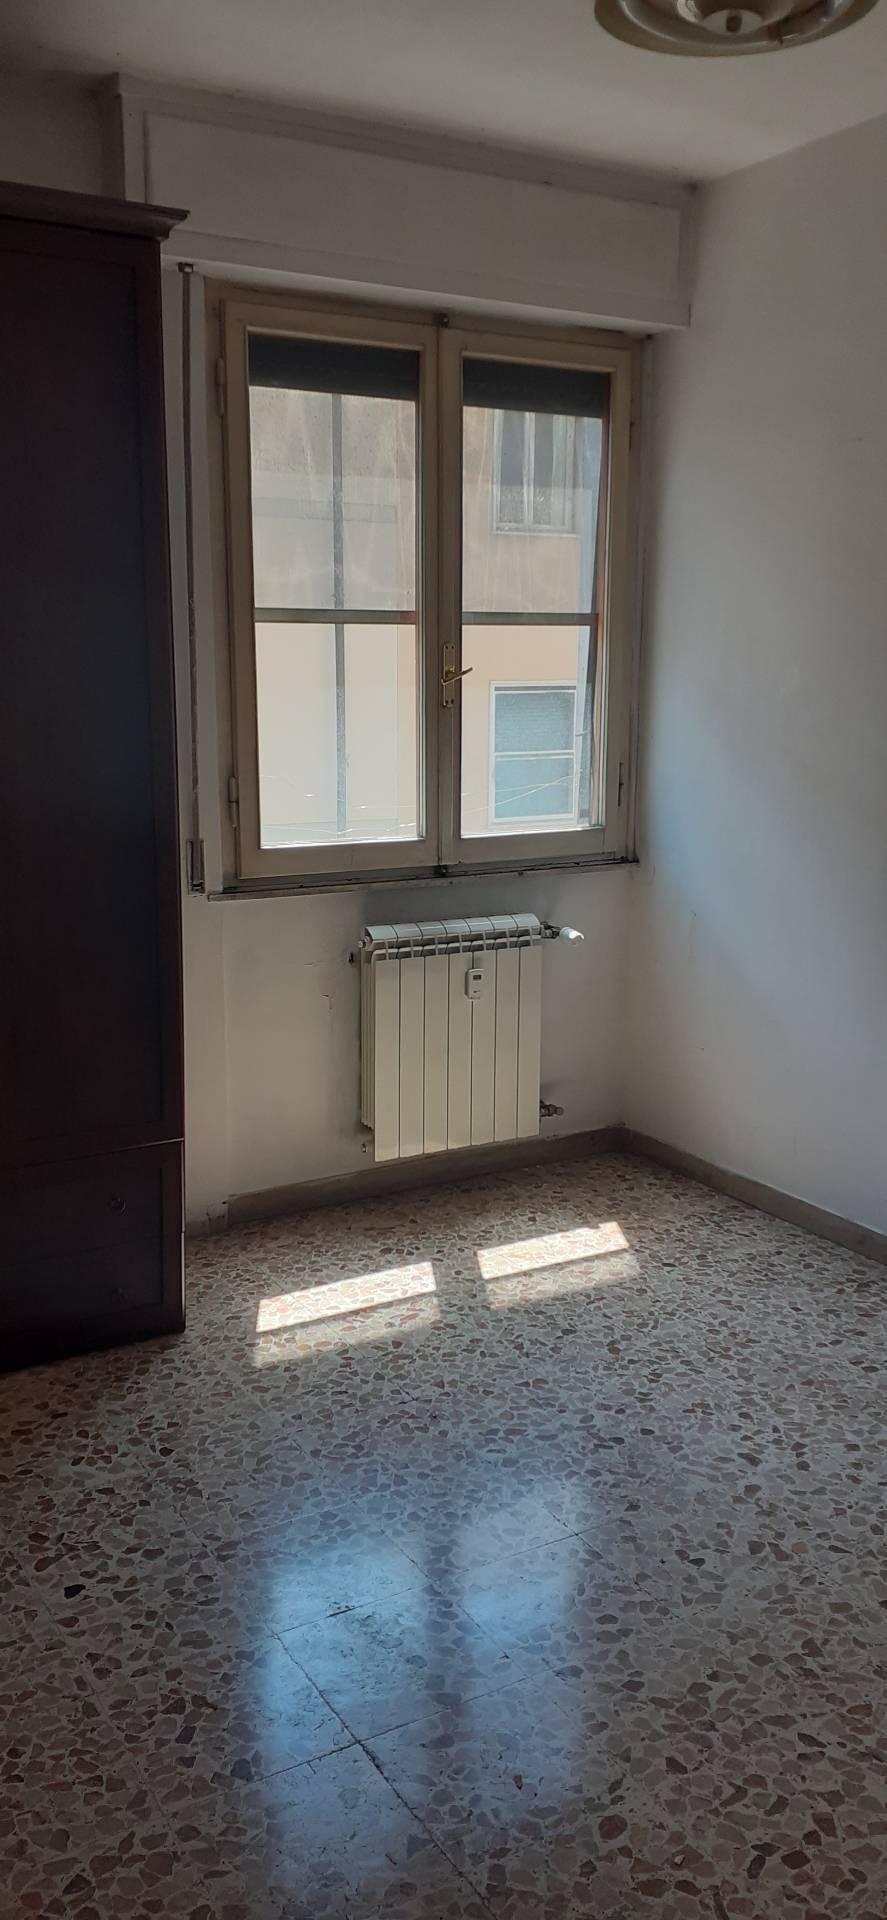 Appartamento in vendita, rif. V2872B